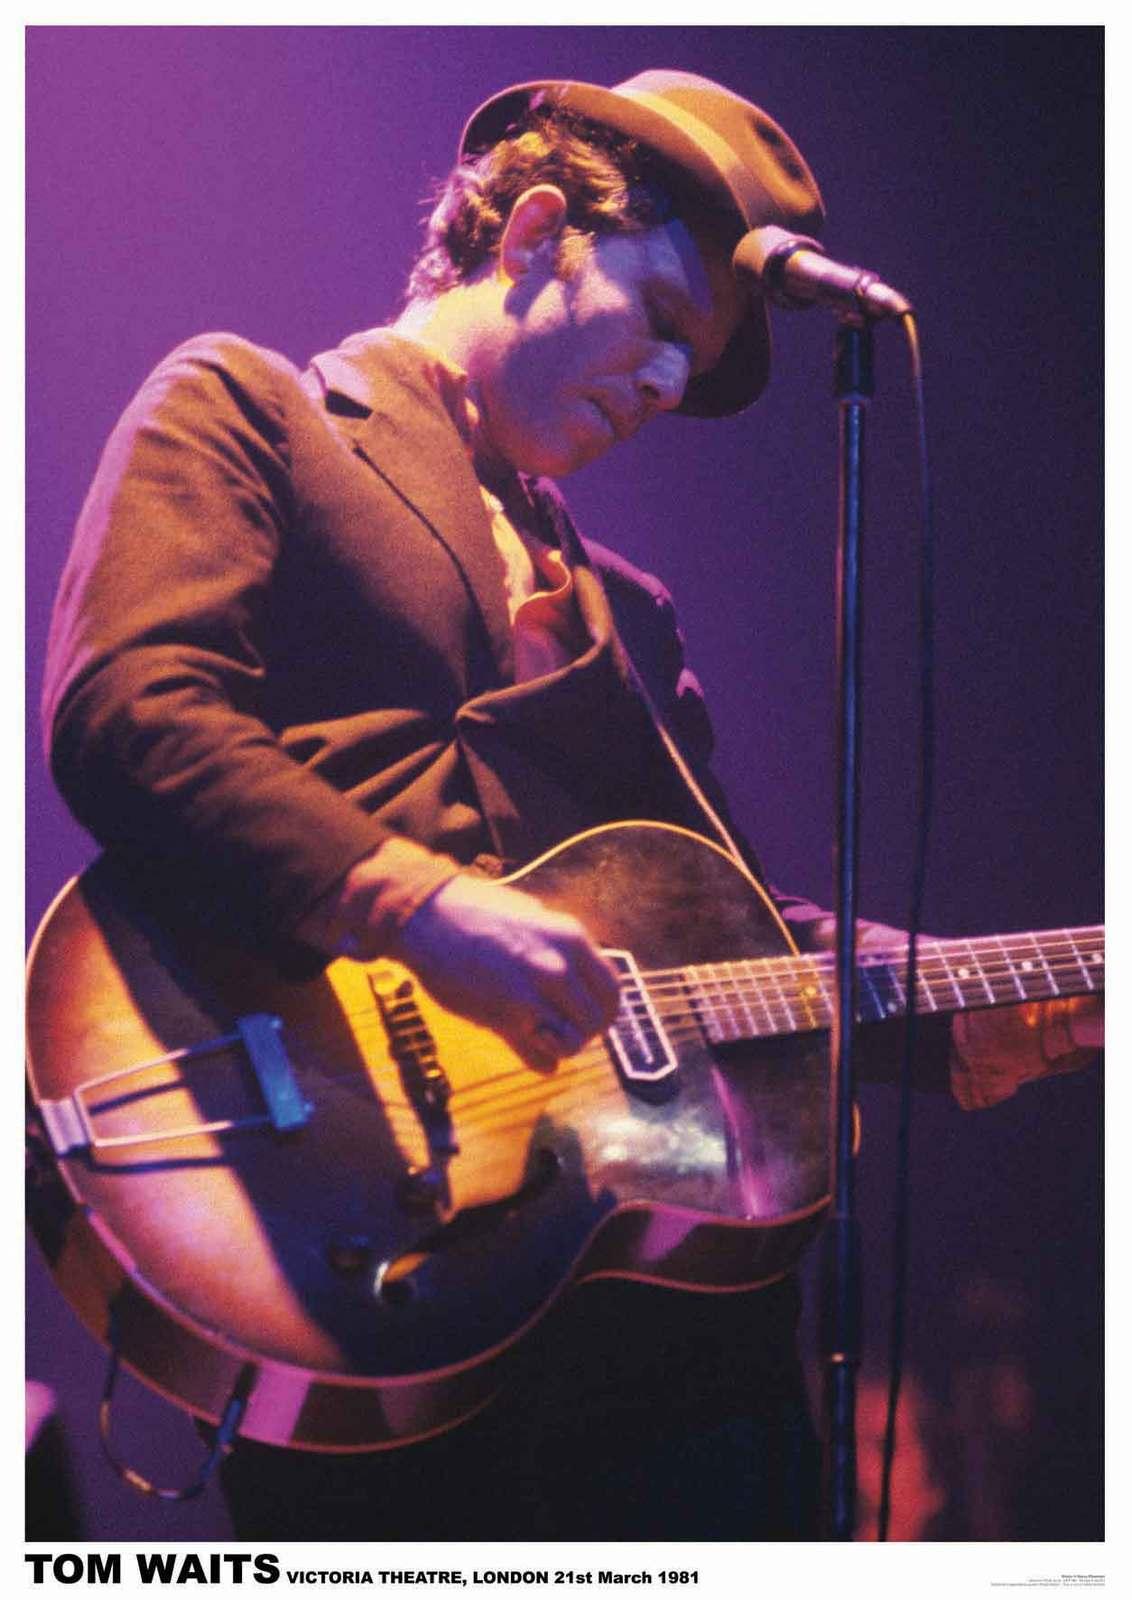 Tom waits poster guitar